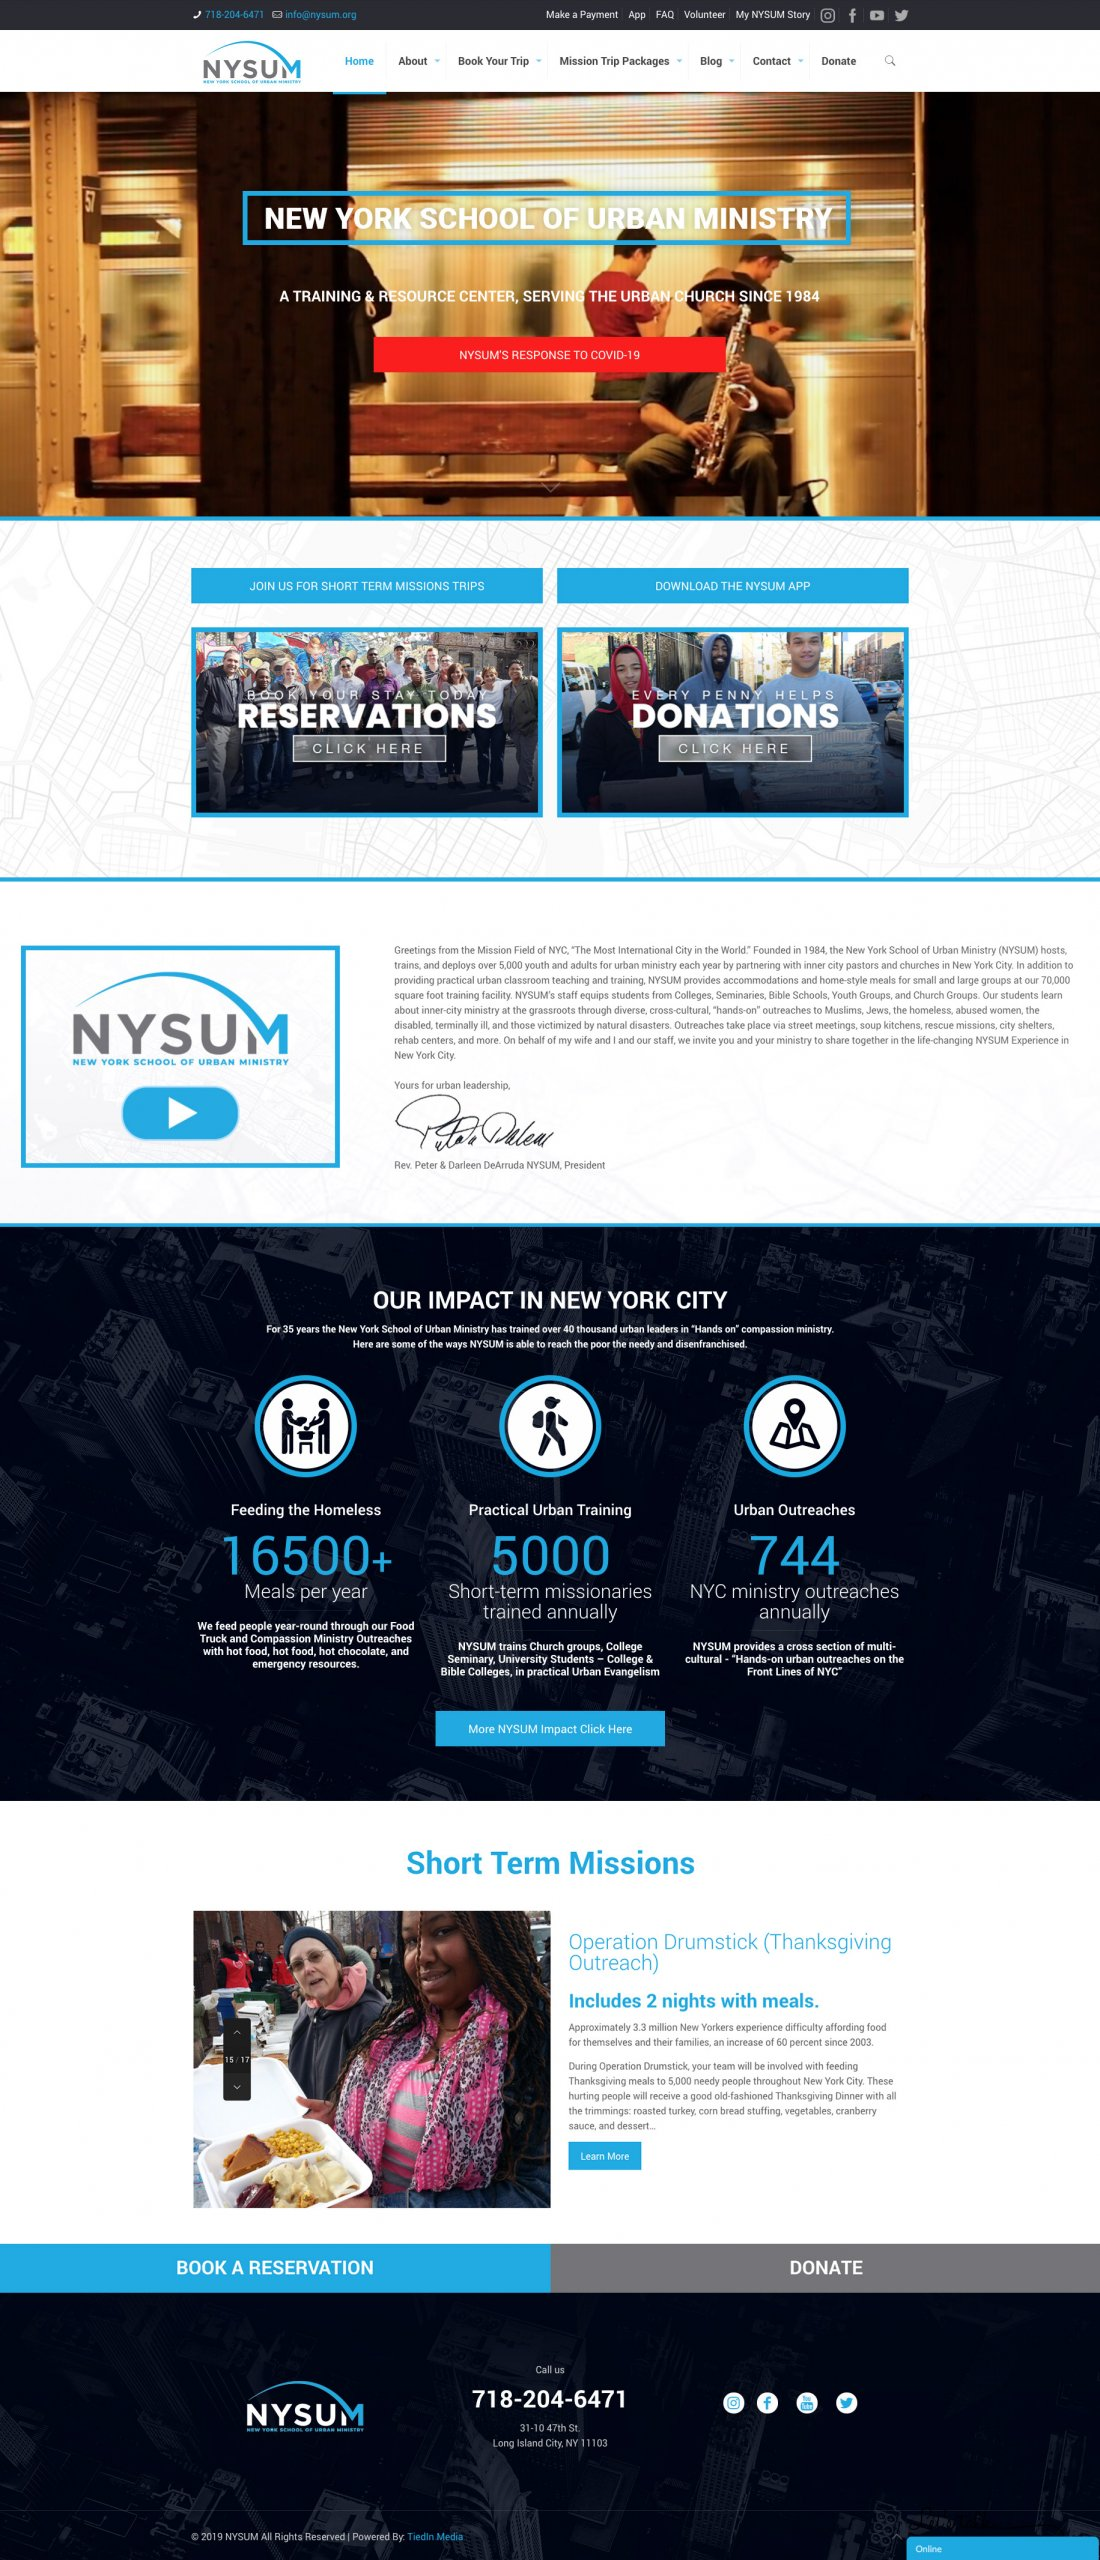 nysum-website-design-Homepage